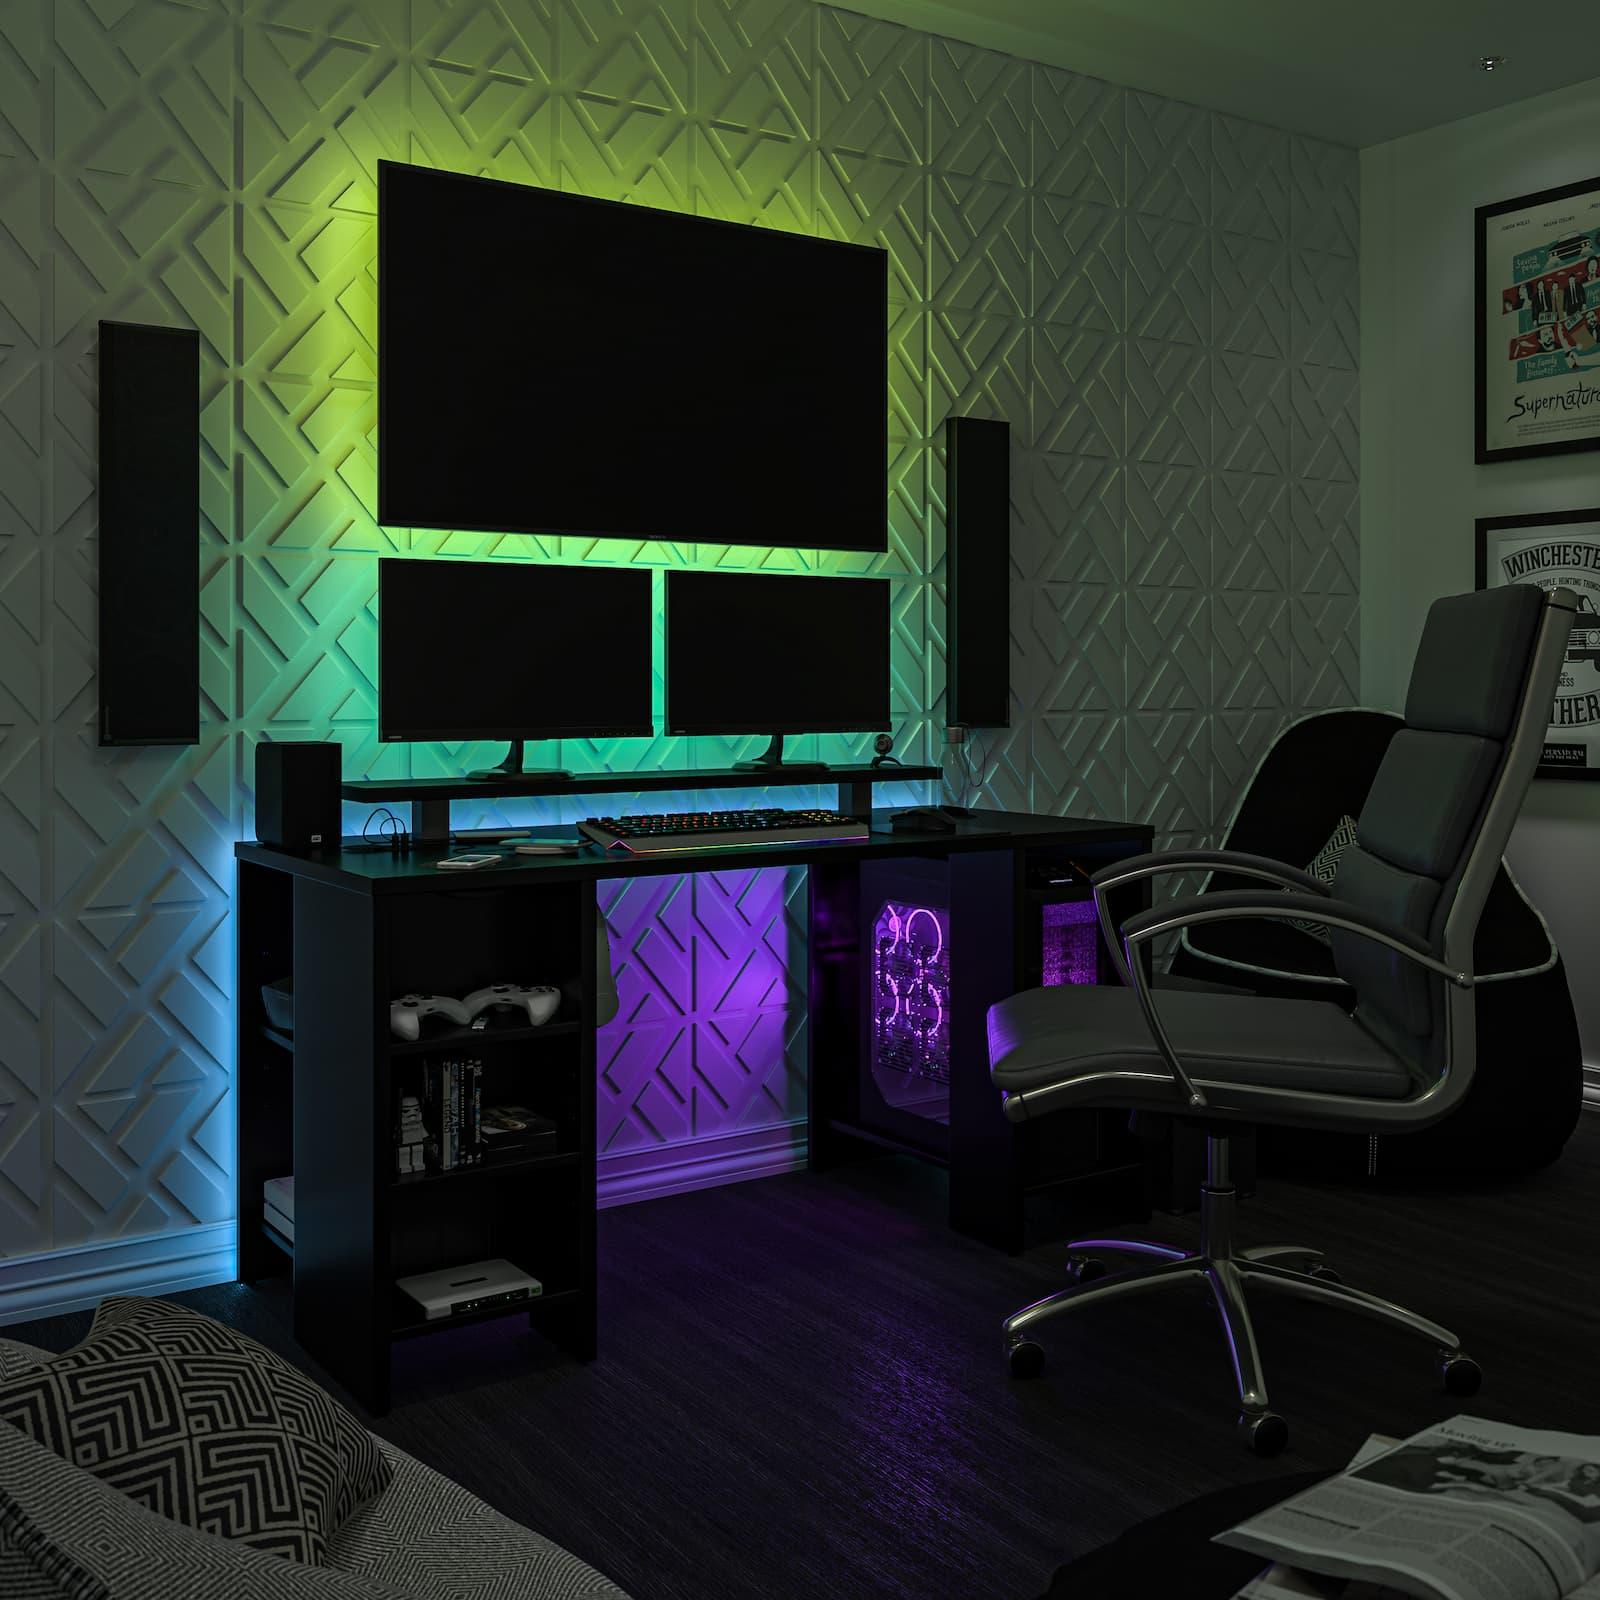 gaming desk LED lights monitors and TV